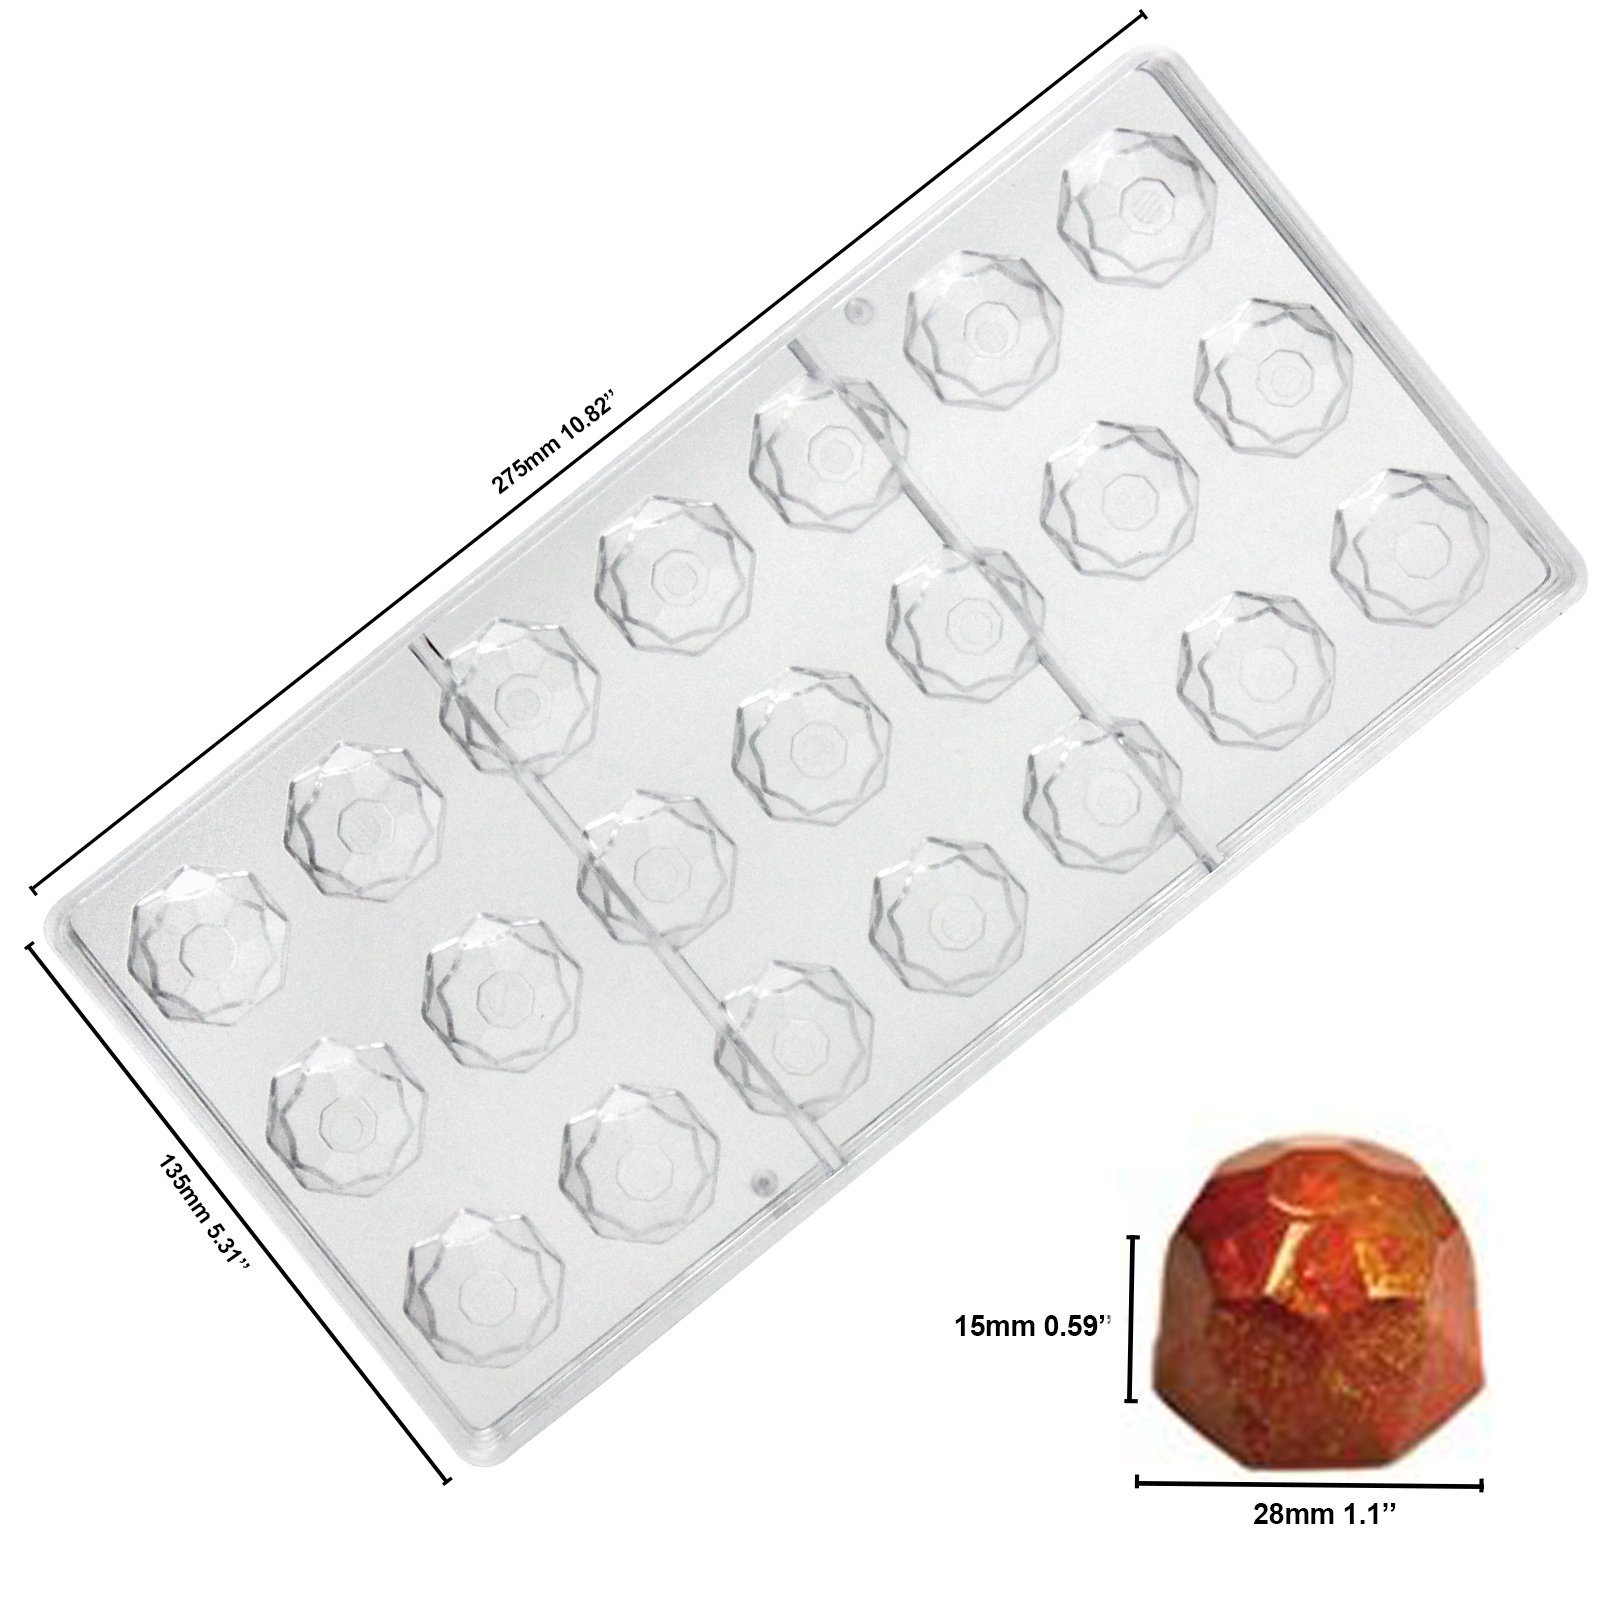 Funshowcase Rose, Heart, Dome, Diamond,Oval Shape Chocolate Mold Plastic 6-piece Set Bite Size by FUNSHOWCASE (Image #5)